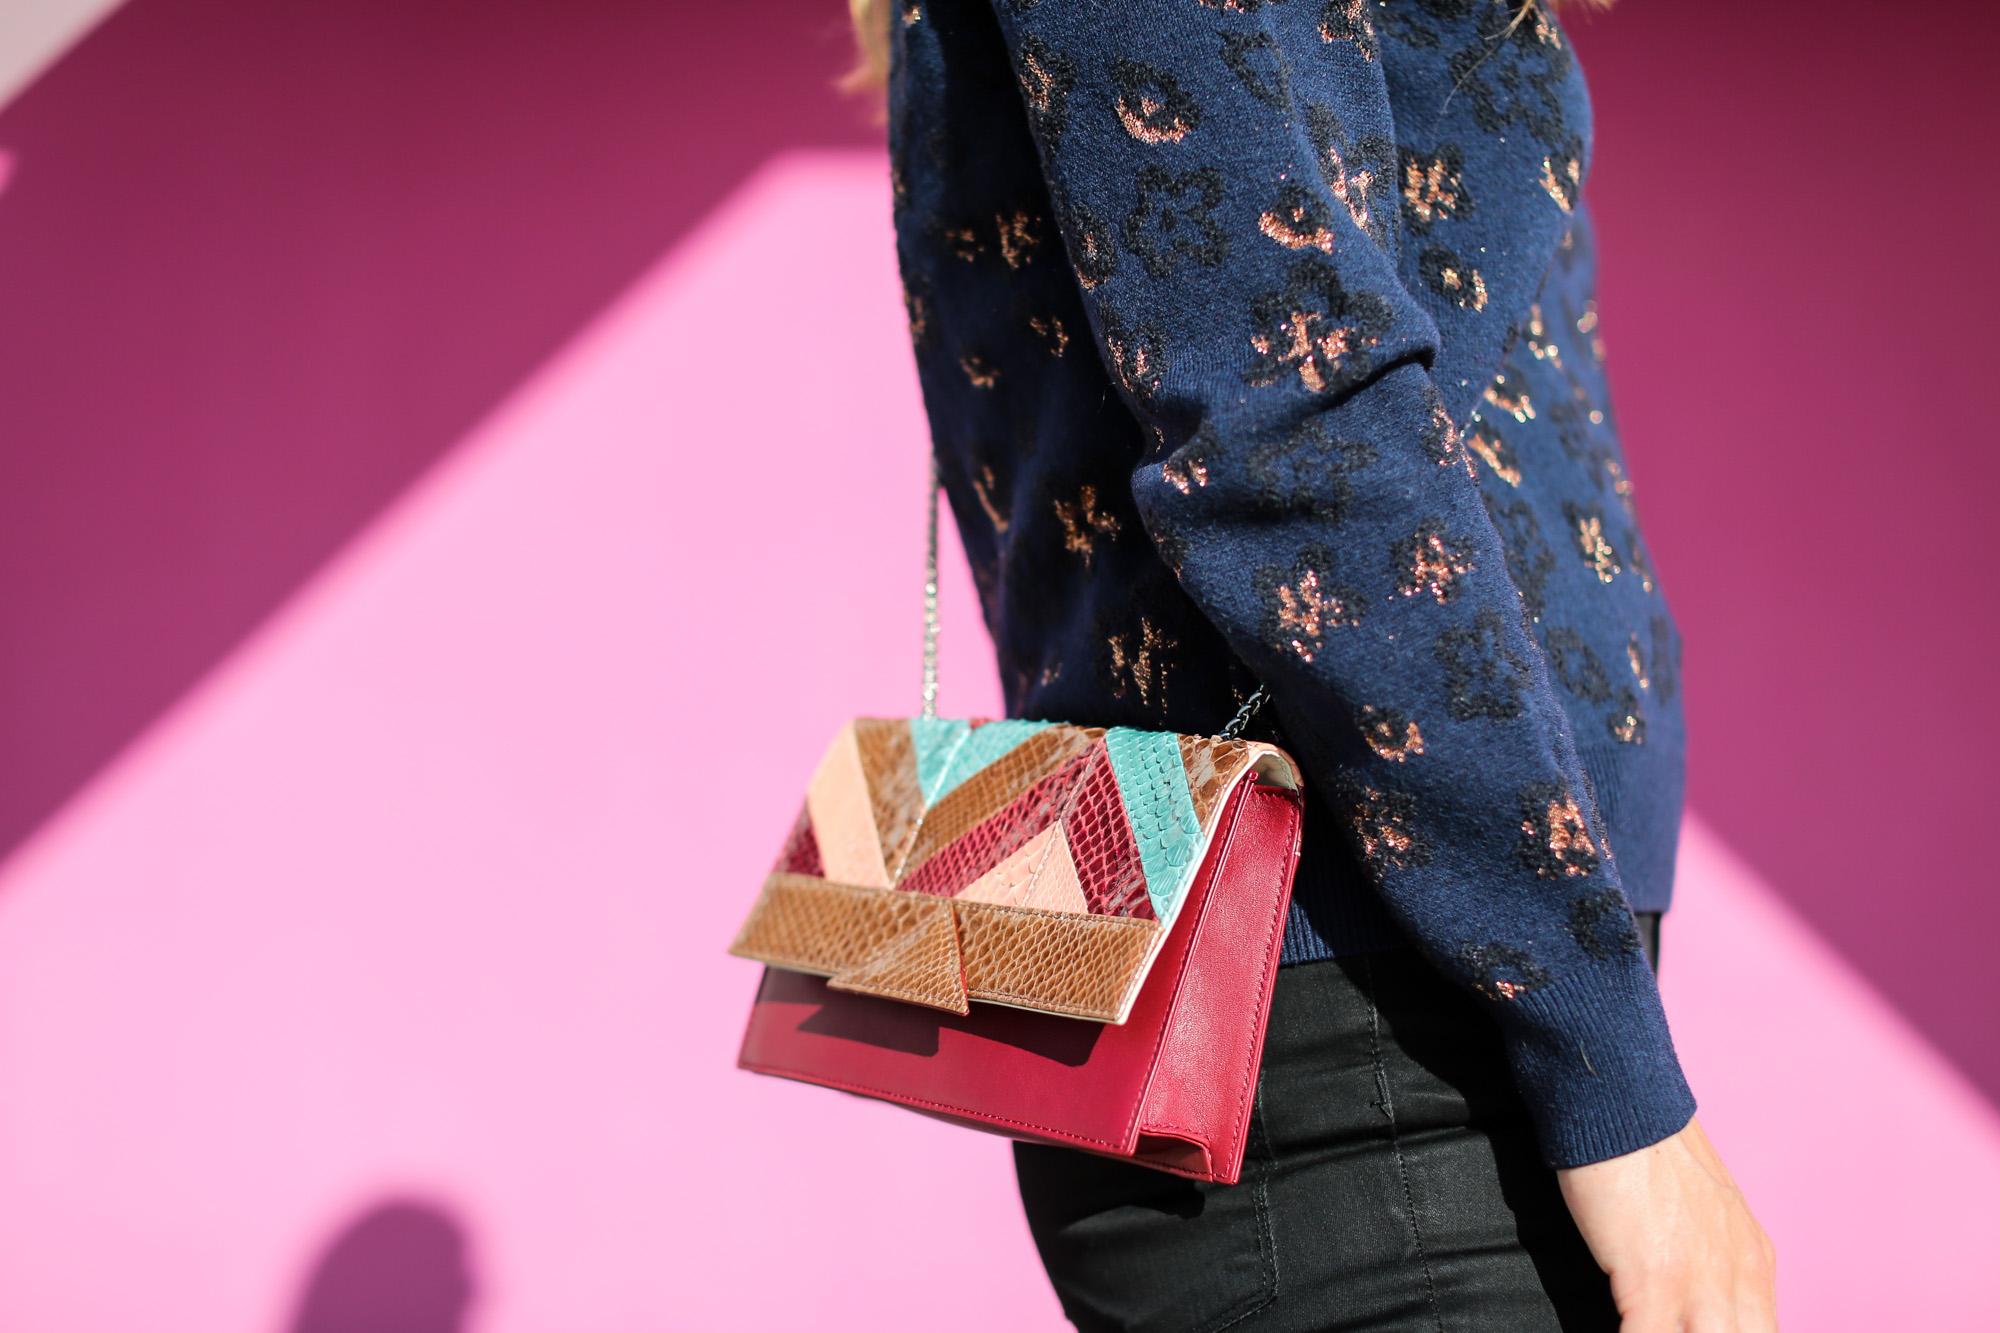 Clochet_fashionblogger_streetstyle_&otherstories_stilettoankleboots_burgundyheroscarf_metallicflowerssweater_titamadridspiga-8